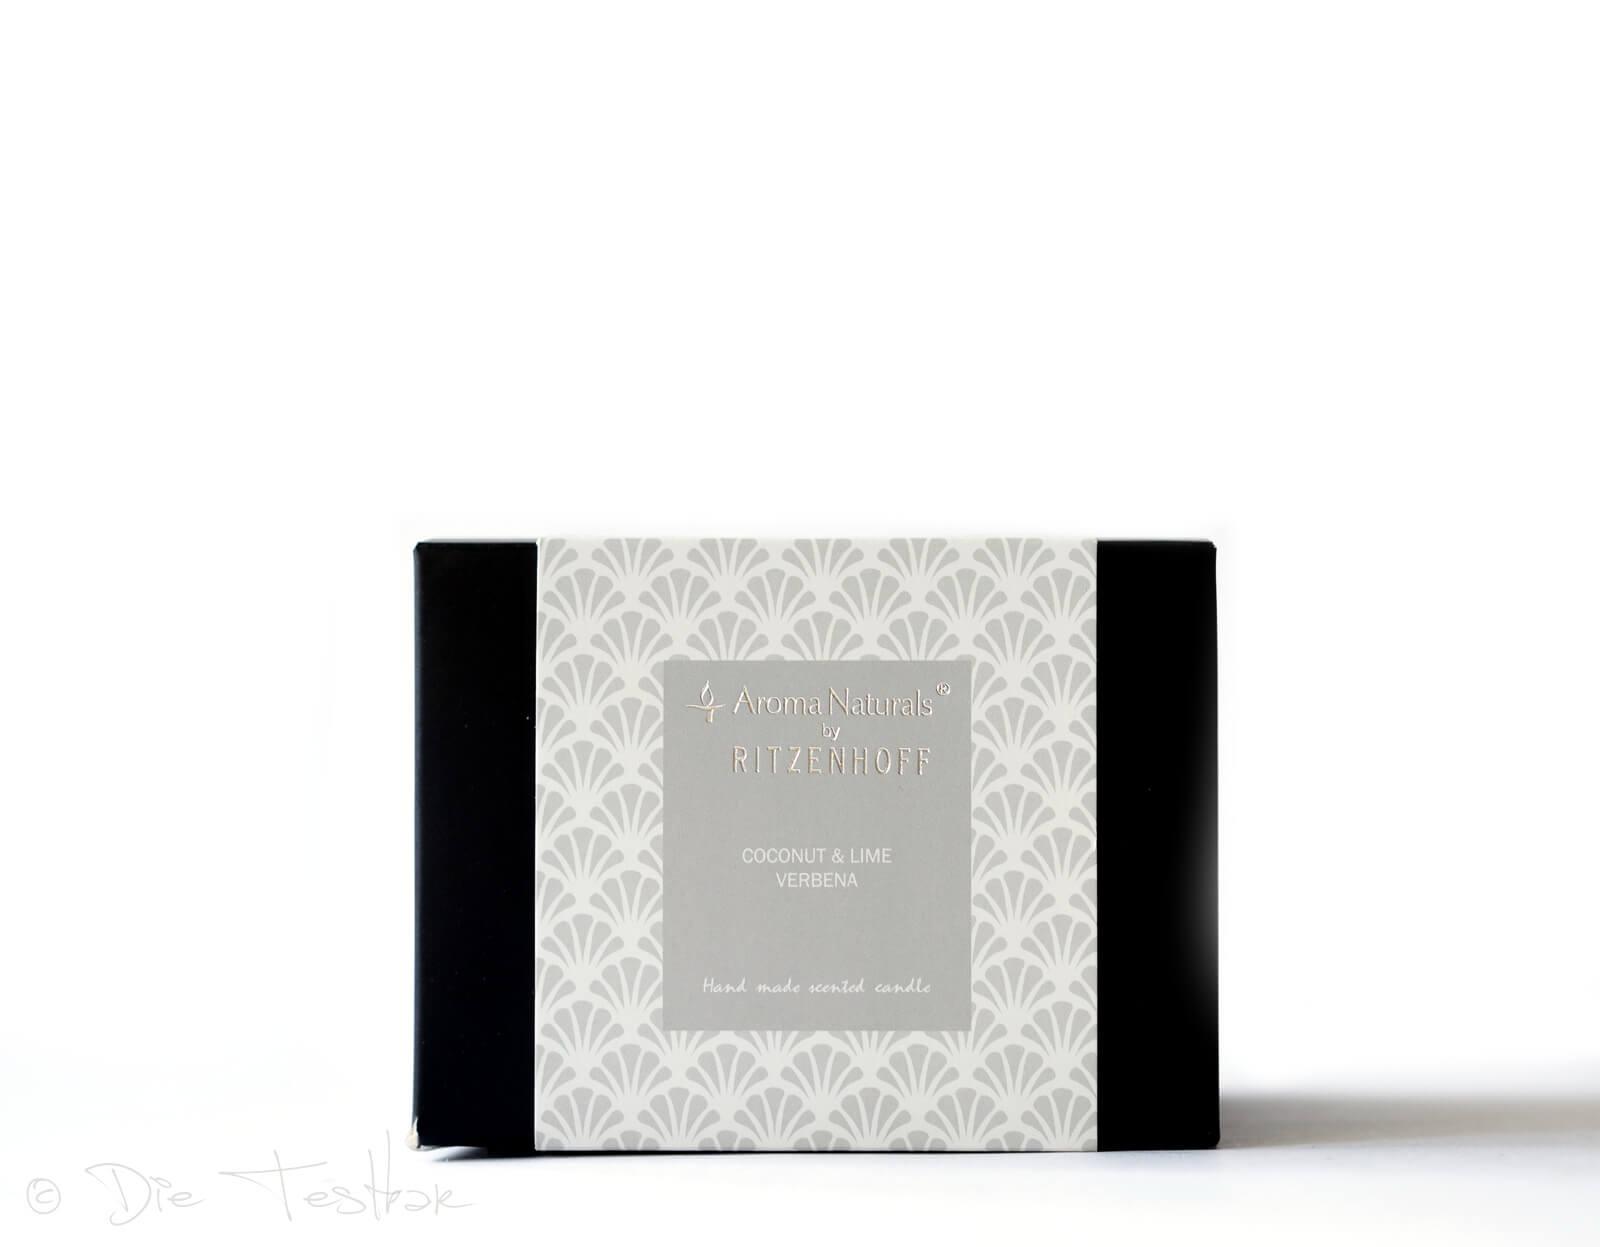 Aroma Naturals -Luxury Duftkerze 3-Docht, Coconut & Lime Verbenna